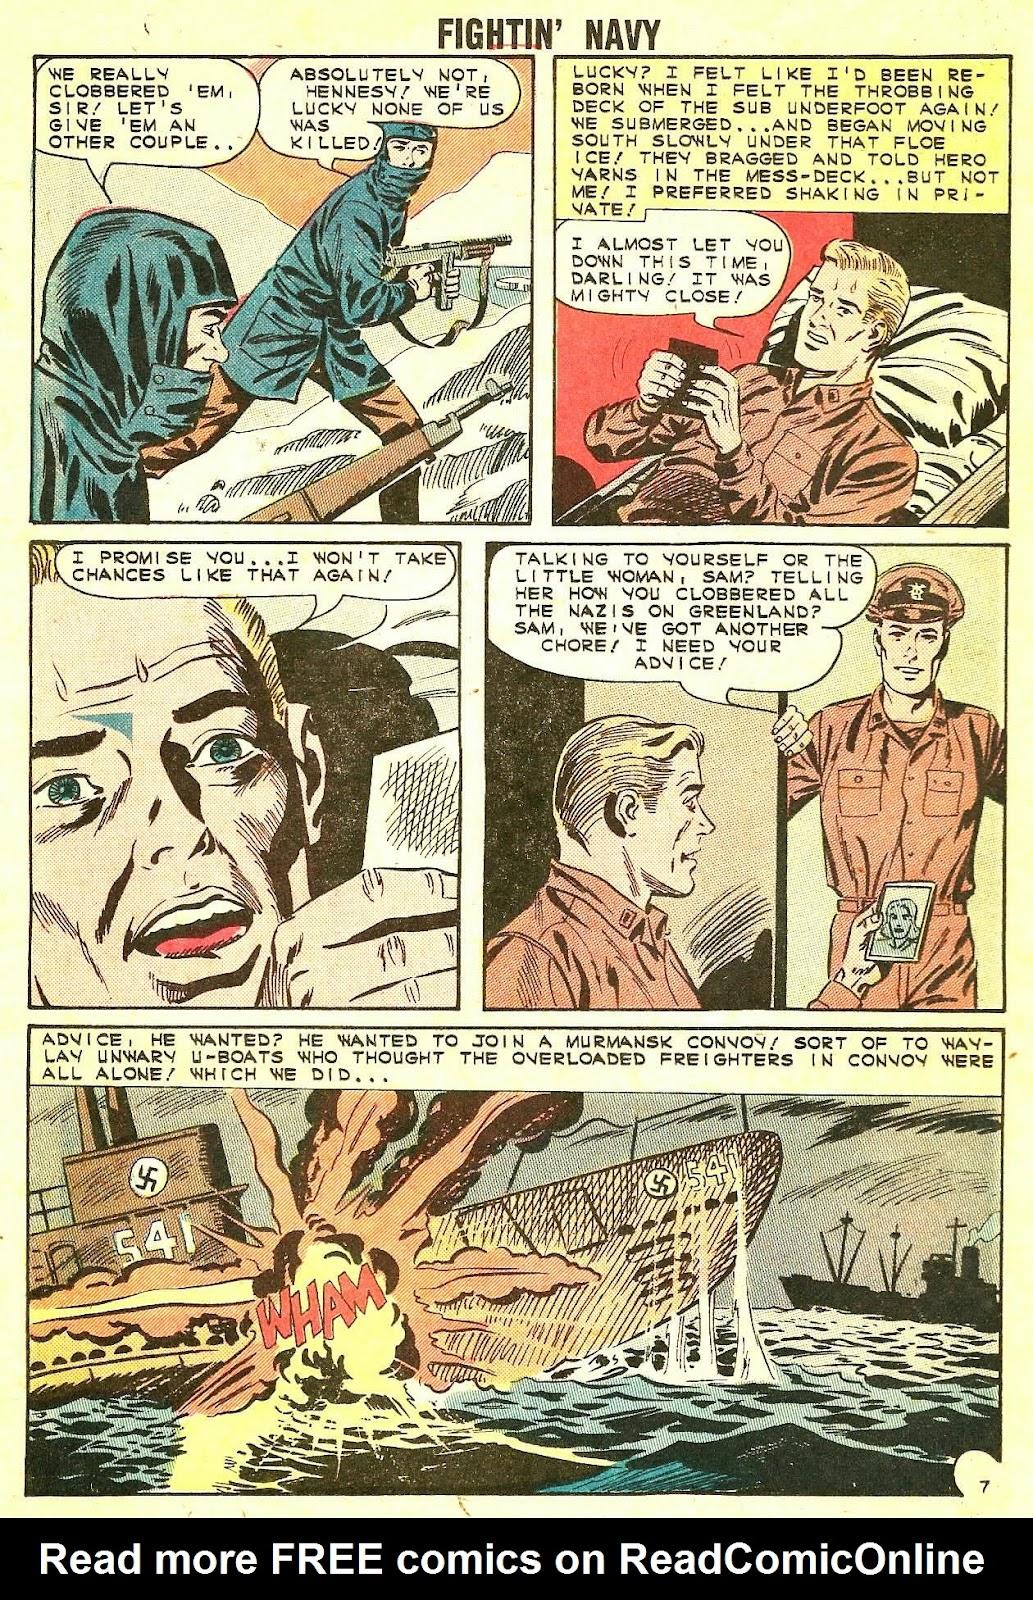 Read online Fightin' Navy comic -  Issue #115 - 16